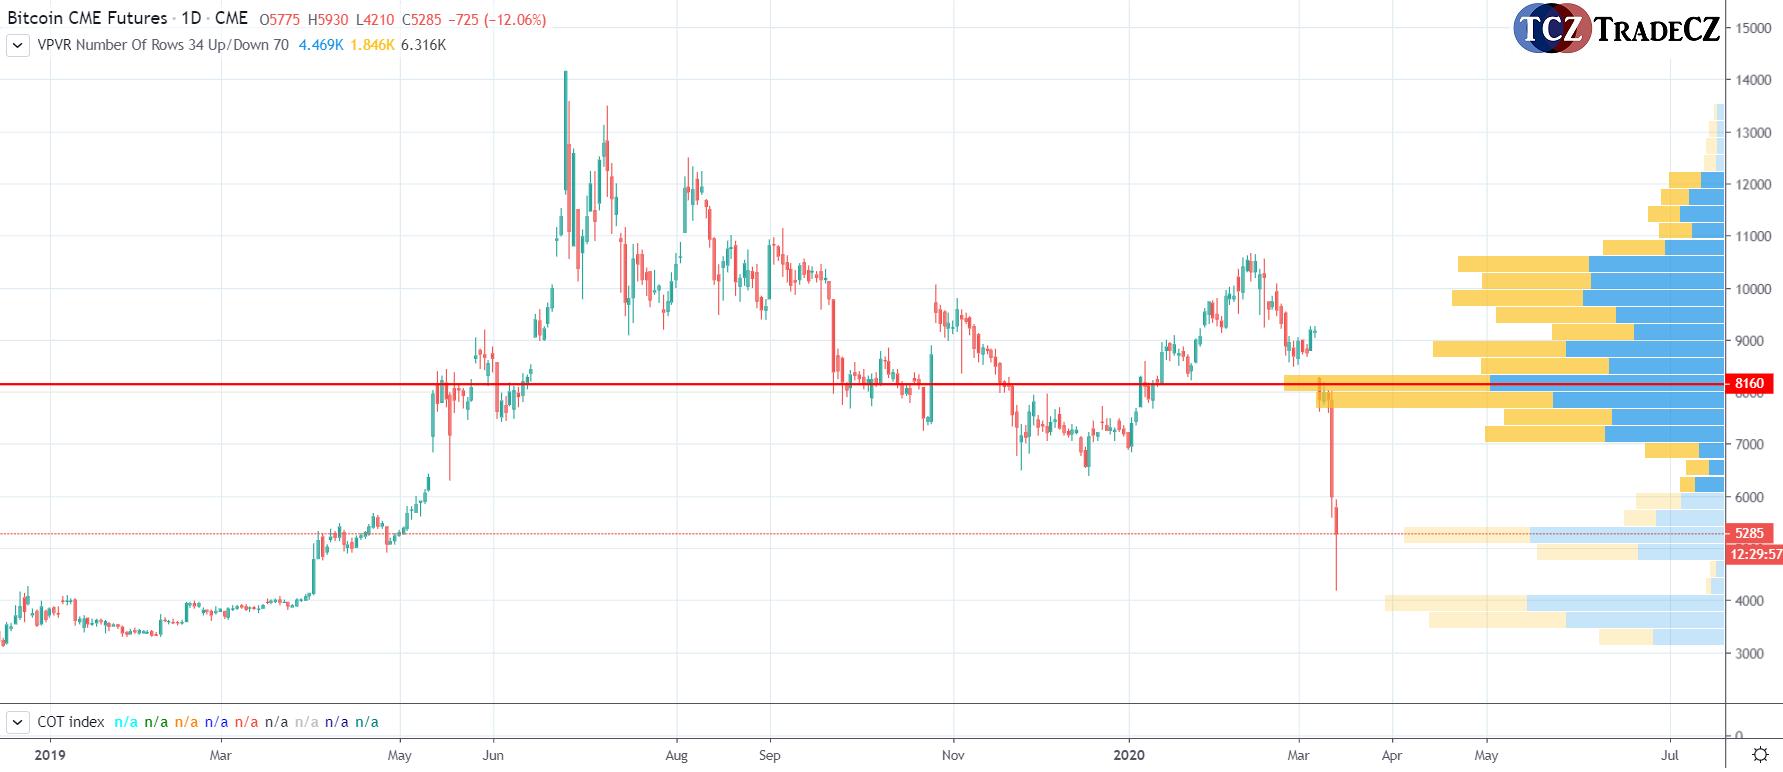 Bitcoin futures market profile